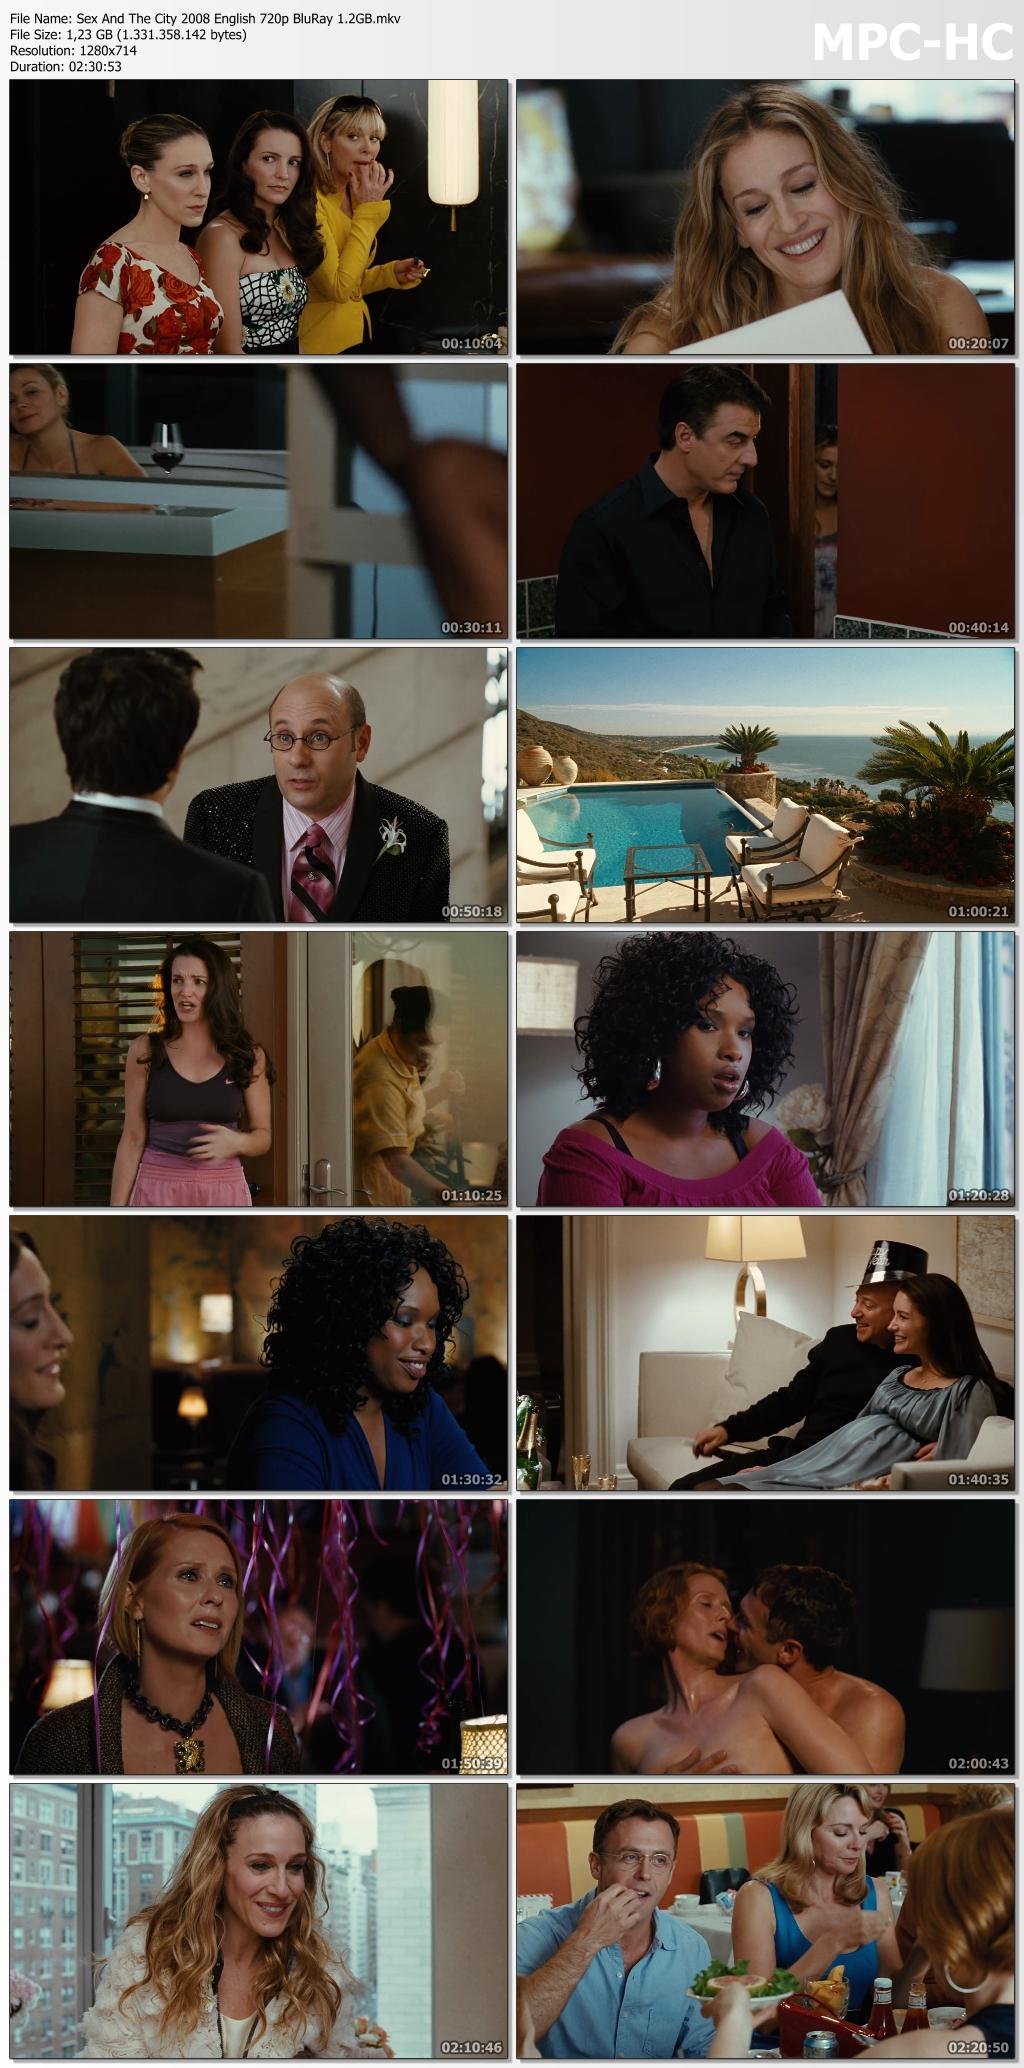 Sex-And-The-City-2008-English-720p-Blu-Ray-1-2-GB-mkv-thumbs